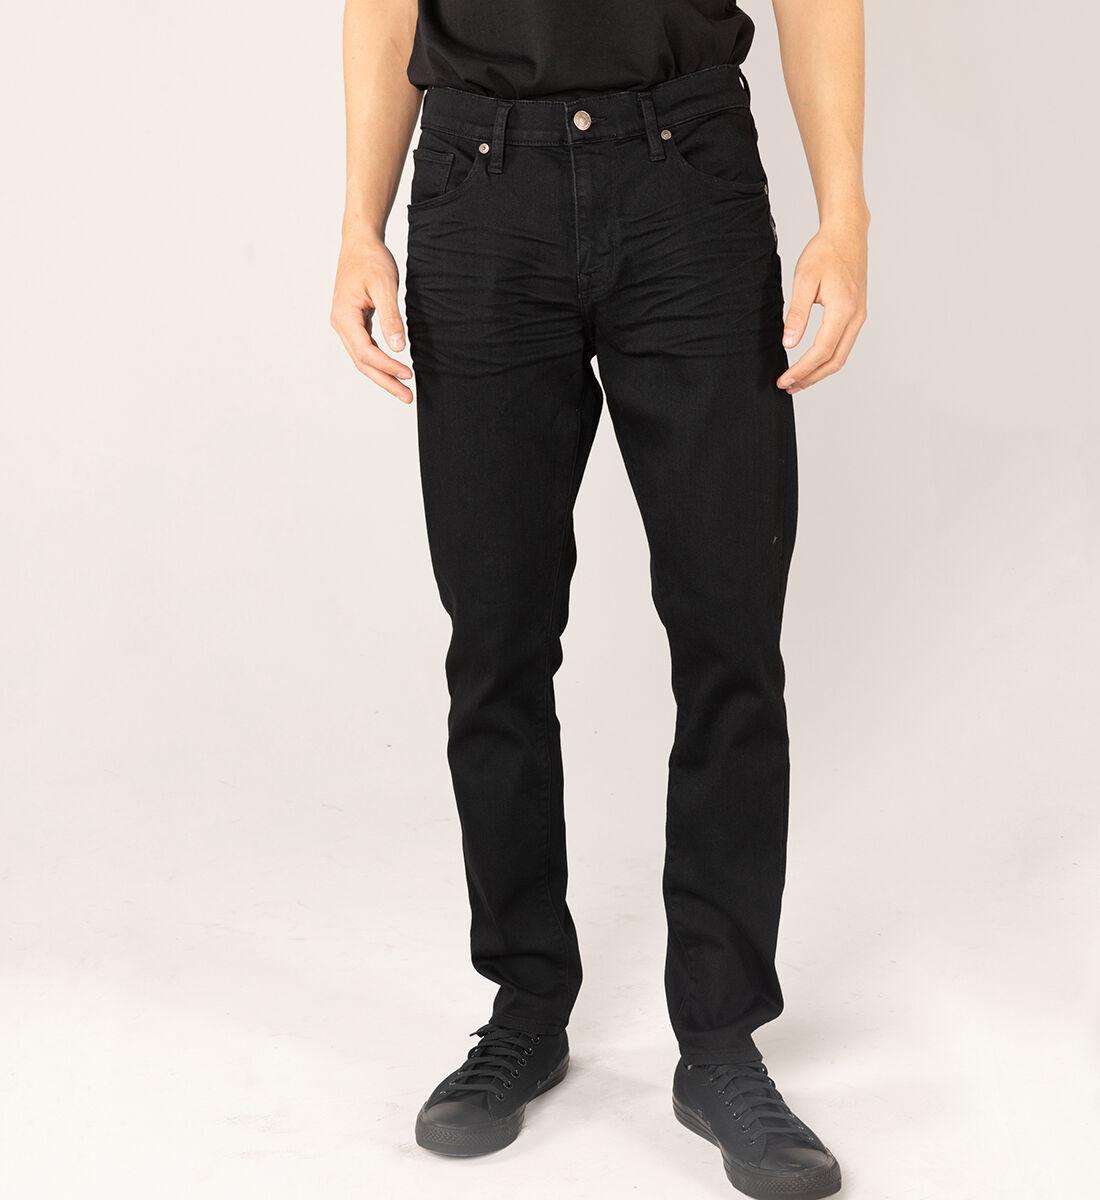 Kenaston  Slim Fit Slim Leg Jeans Front